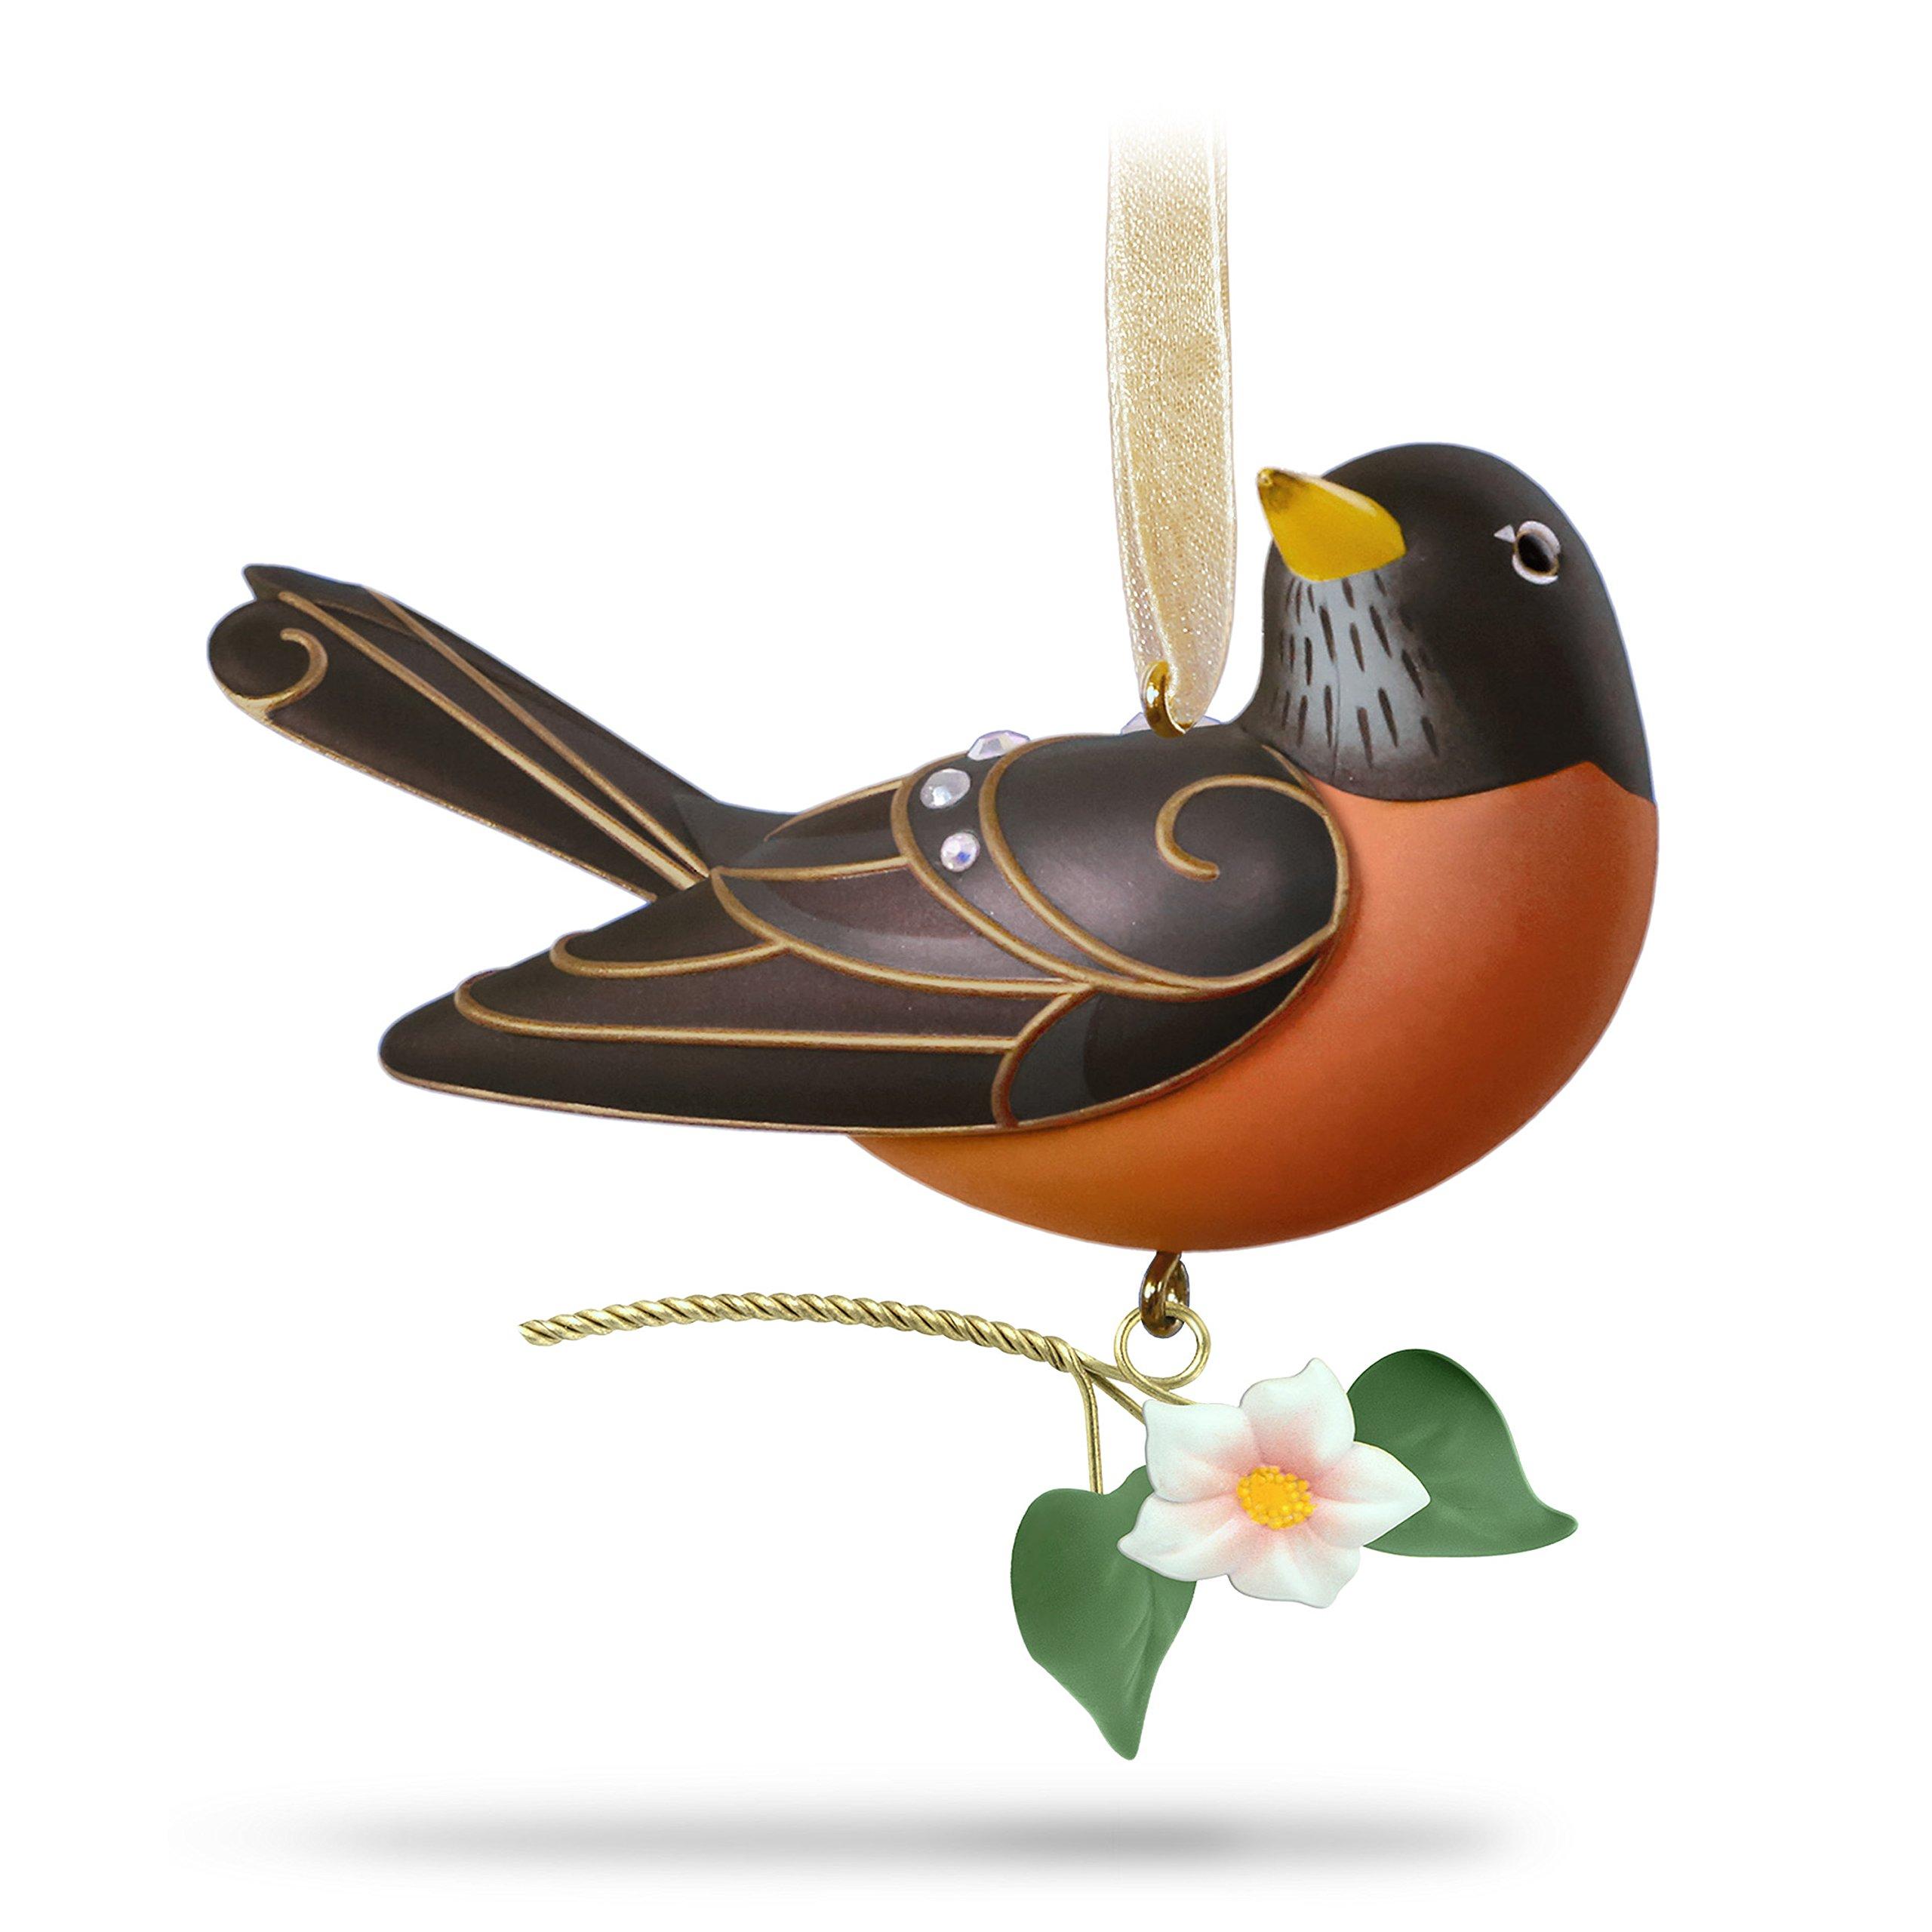 Hallmark Keepsake Christmas Ornament 2018 Year Dated, Beauty of Birds Robin